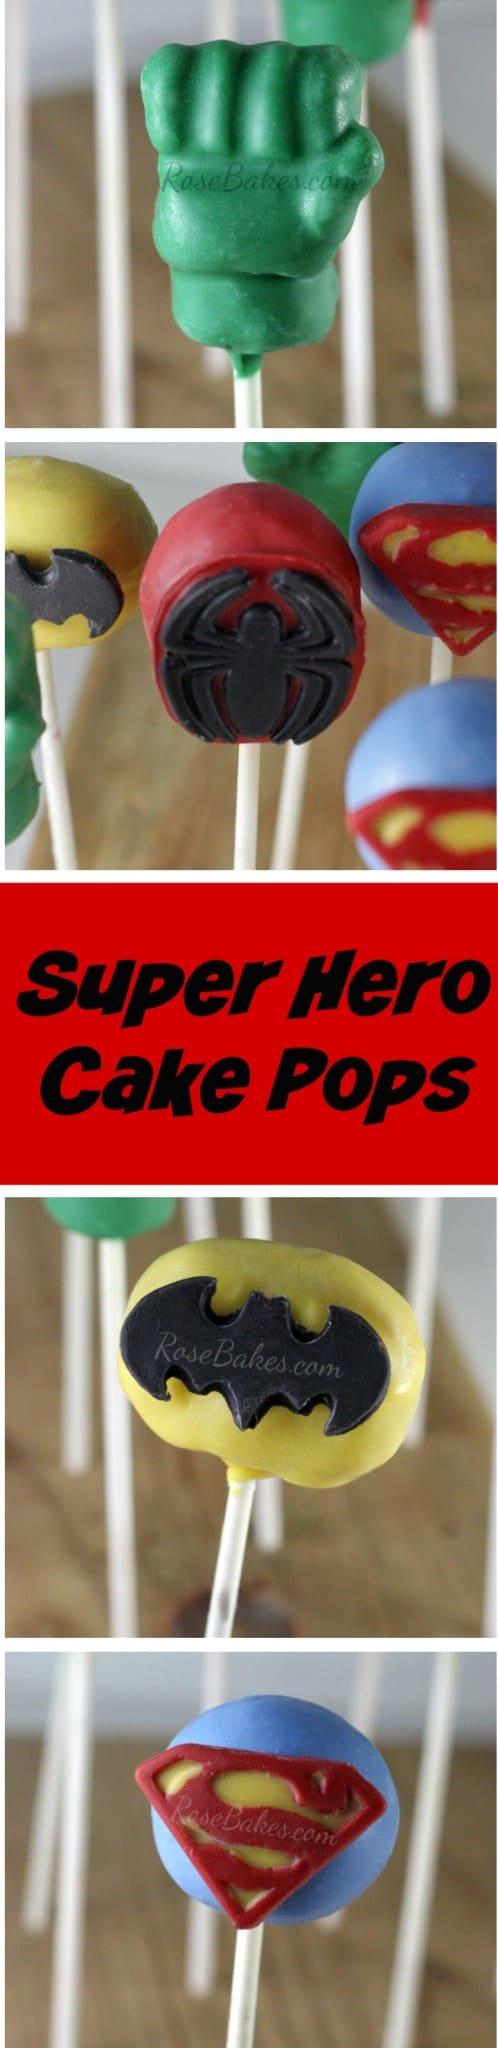 Super Hero Cake Pops Hulk, Spiderman, Batman, Superman by RoseBakes